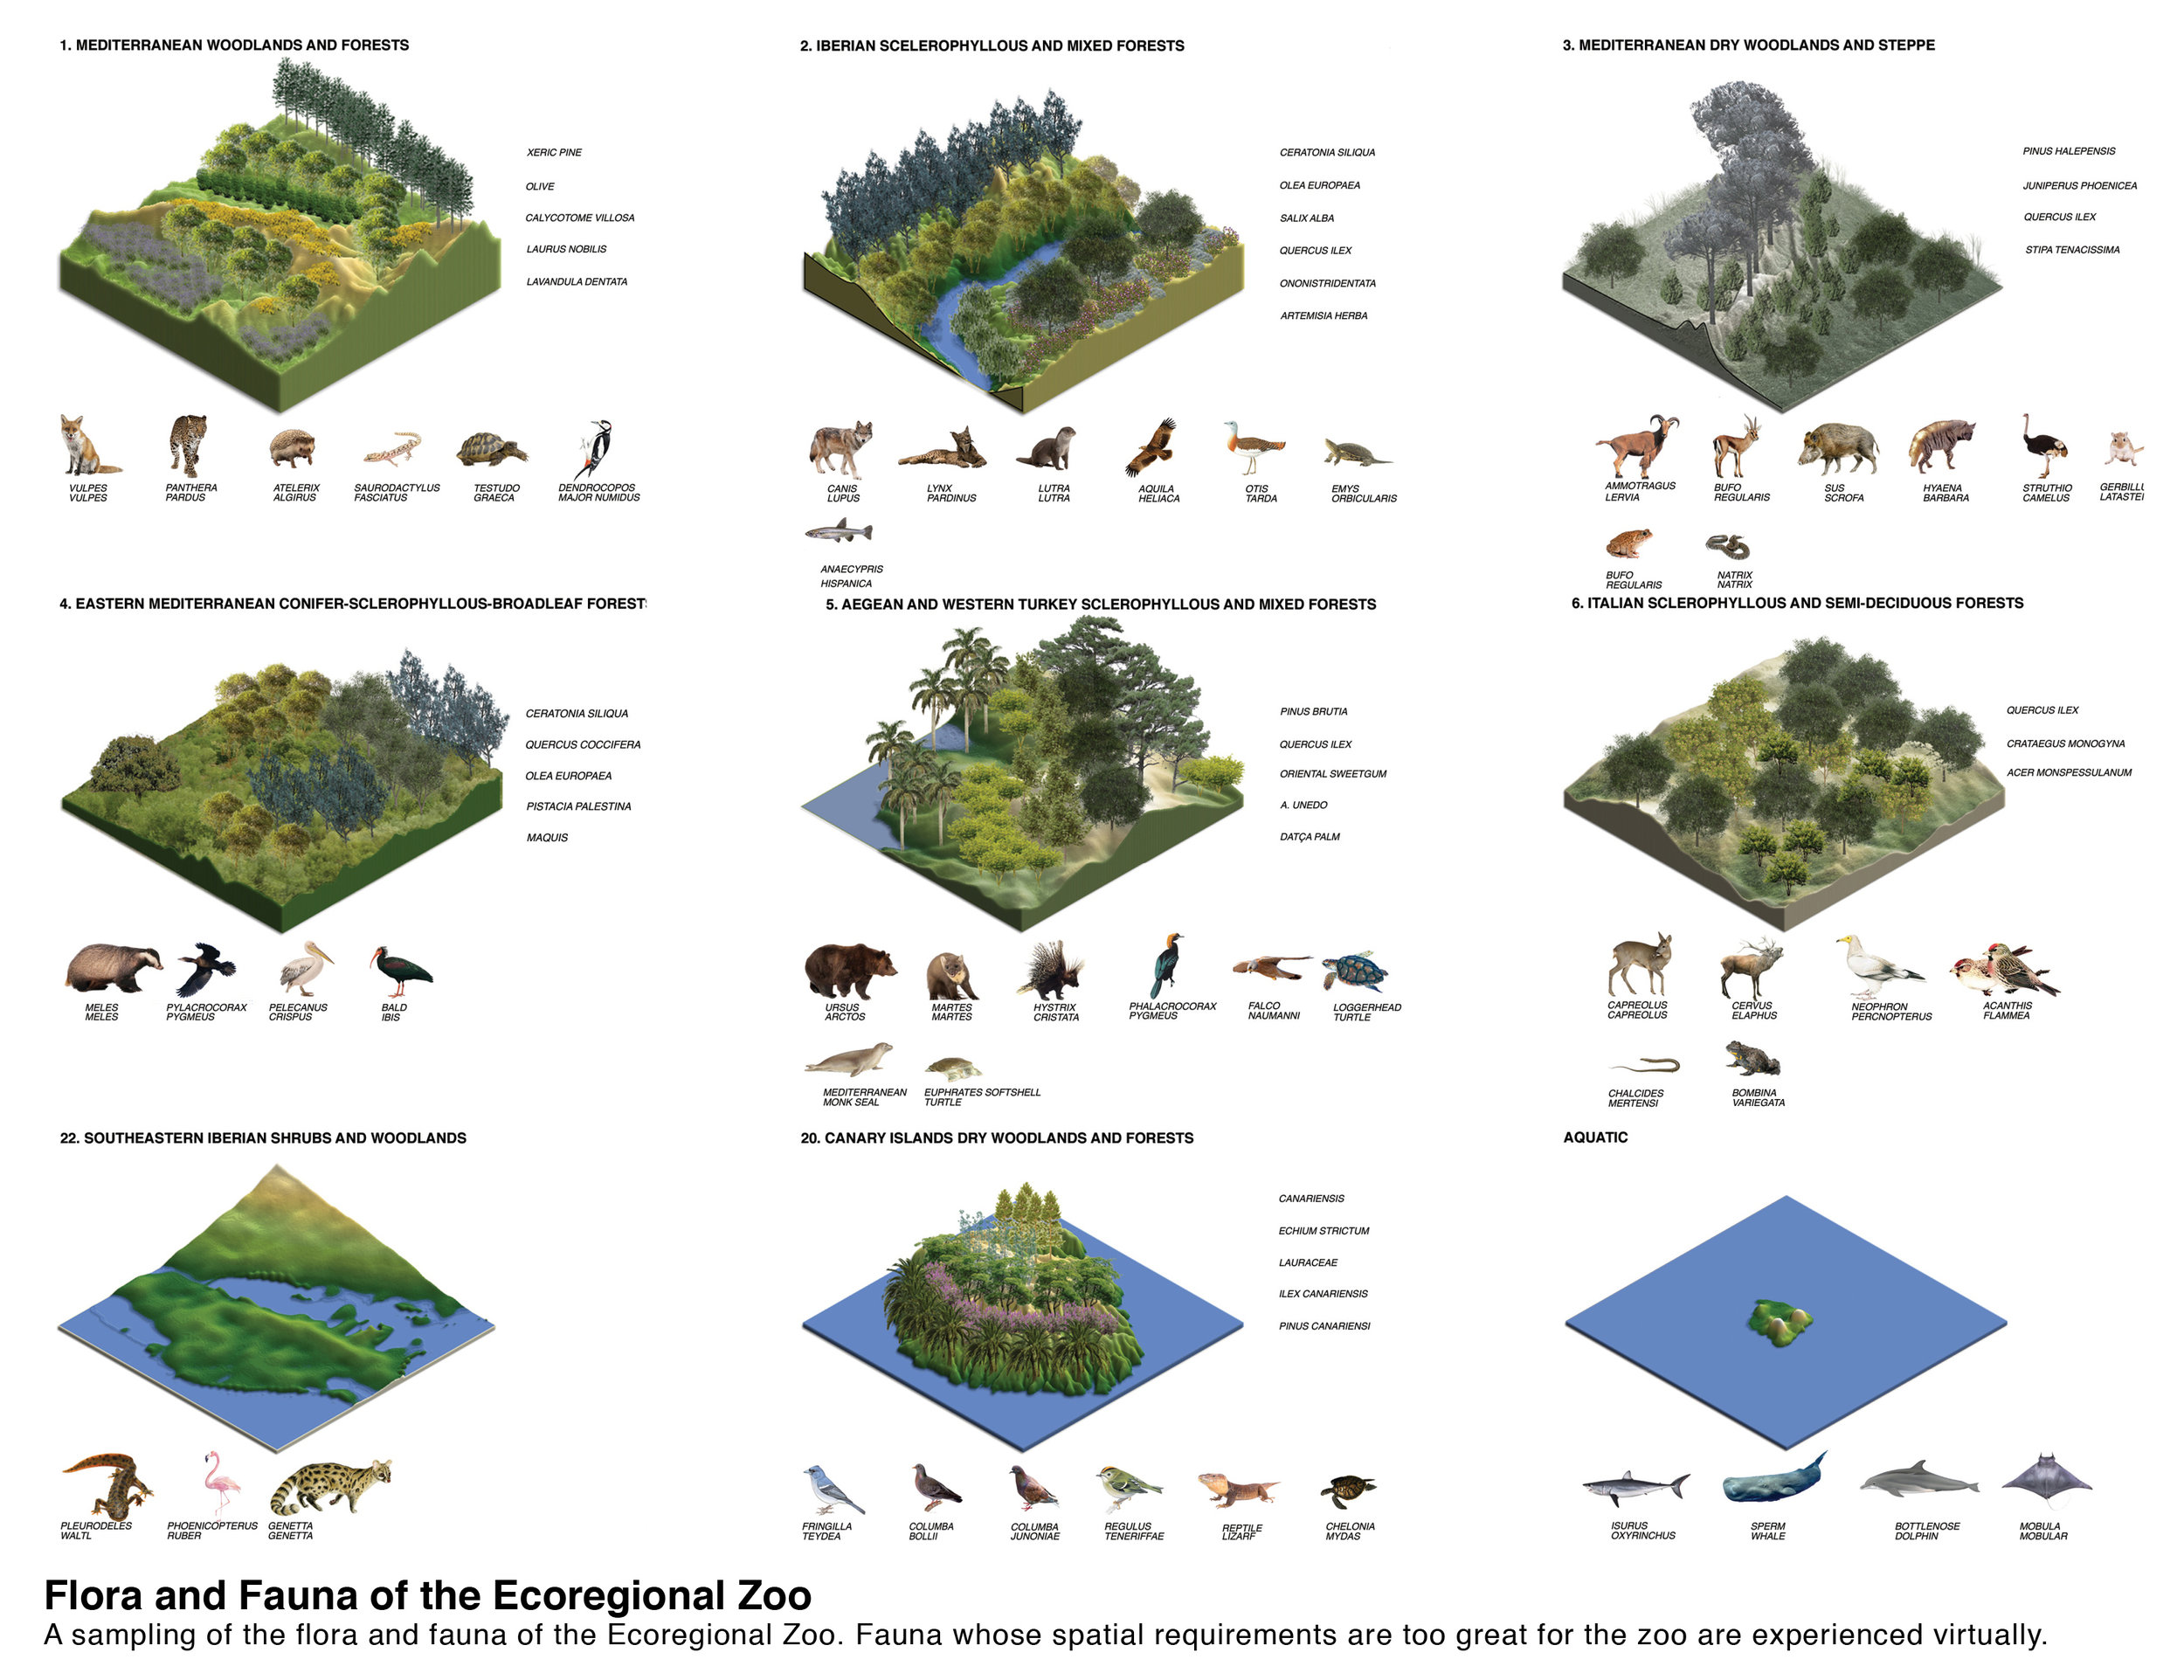 hinterlands_ecoregional zoo_03.jpg